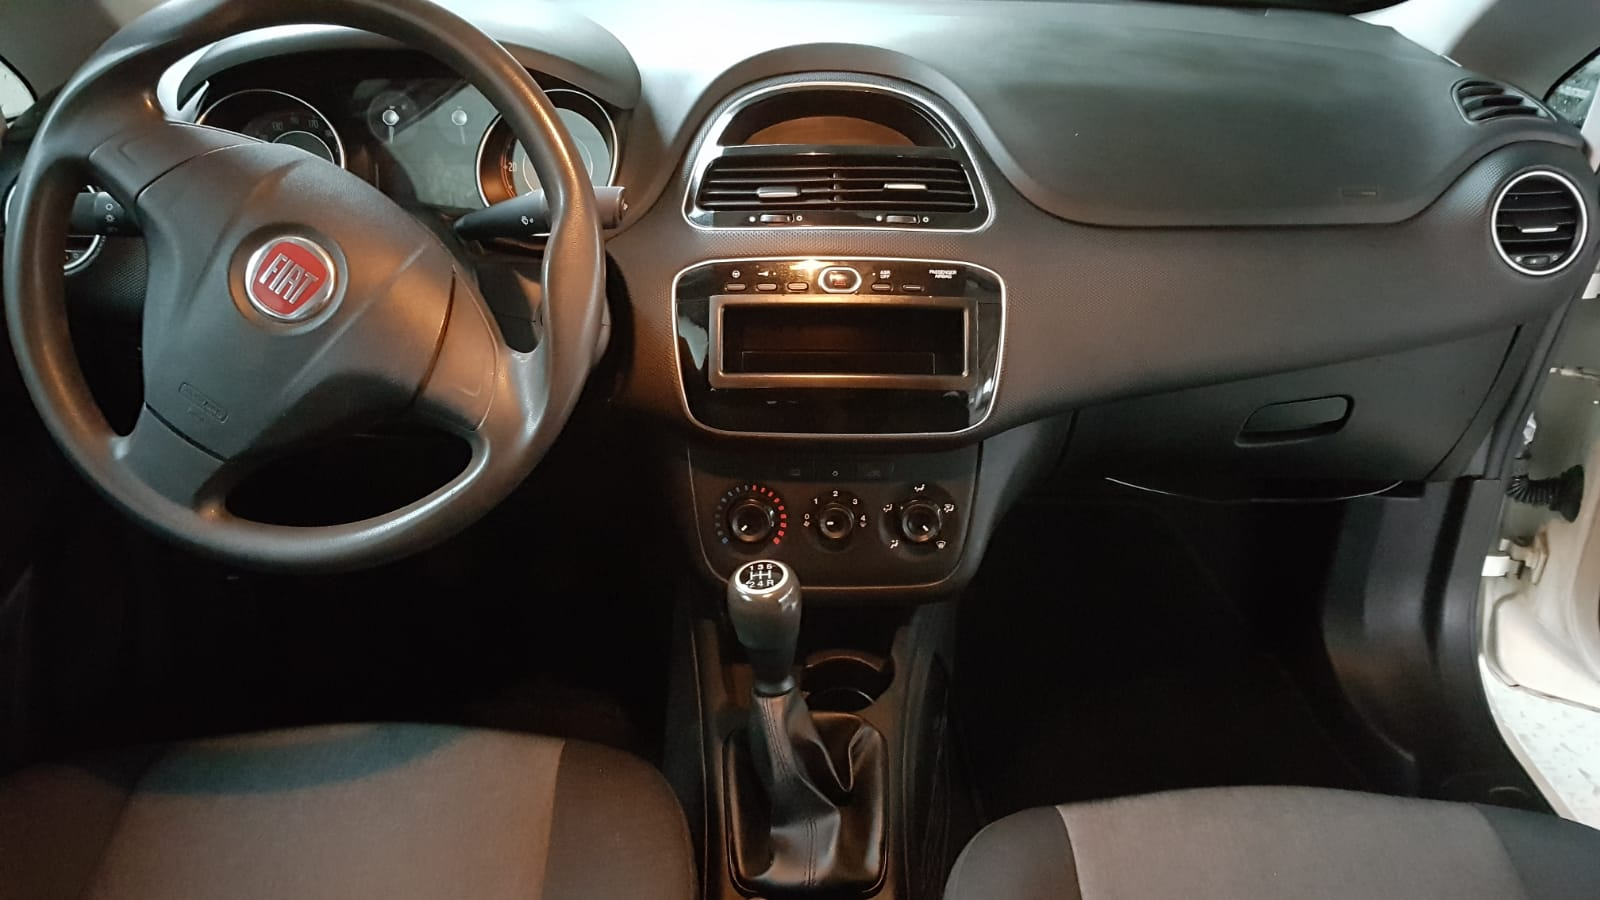 Fiat Punto 1.3 Mtj 9